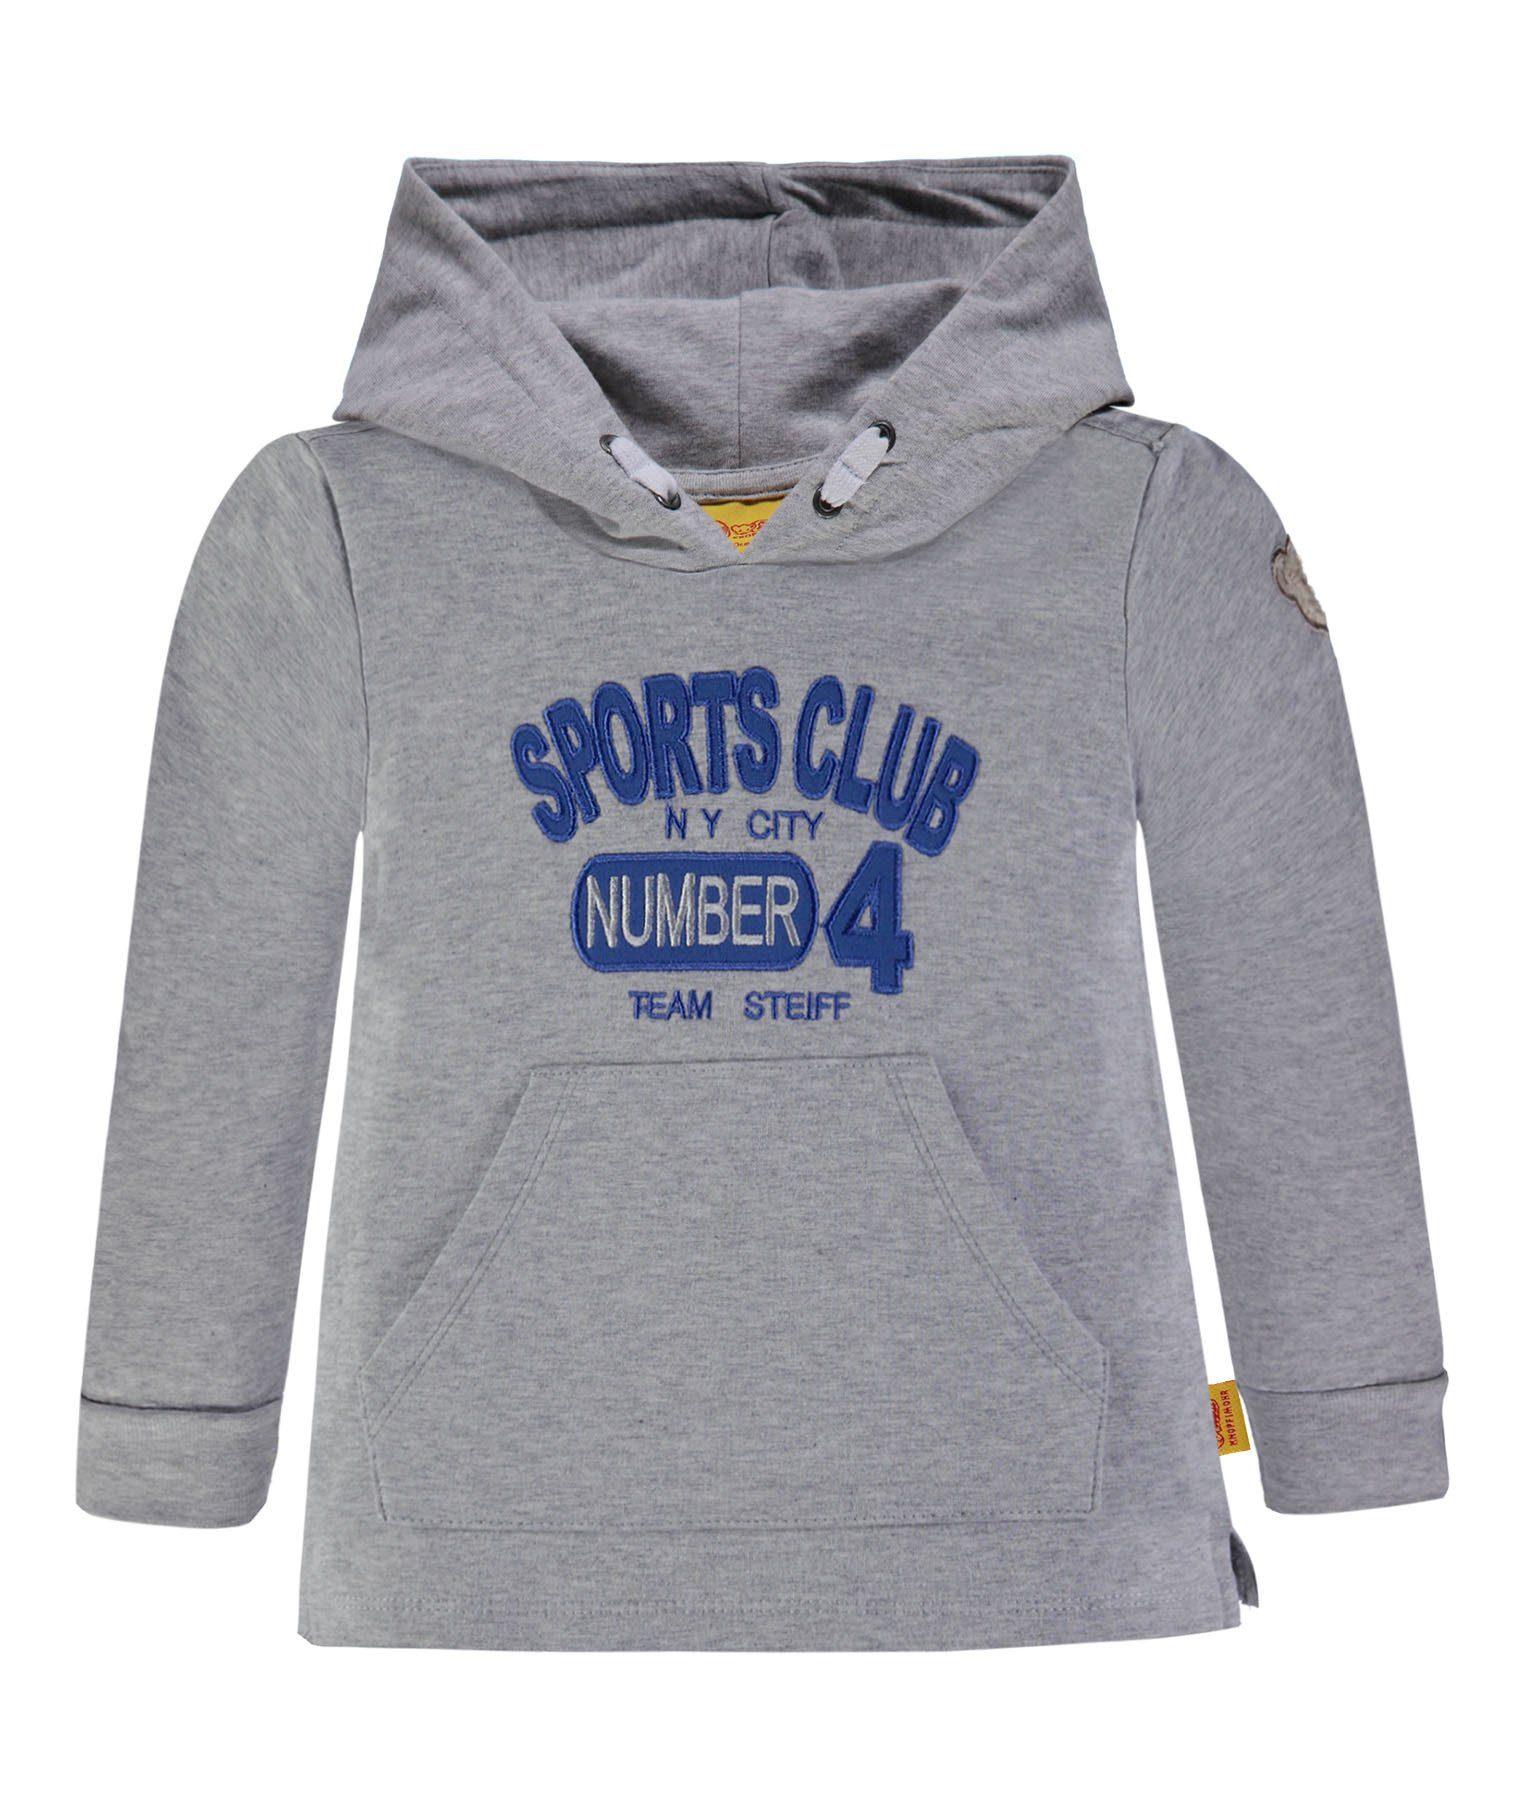 Steiff Sweatshirt große Kapuze